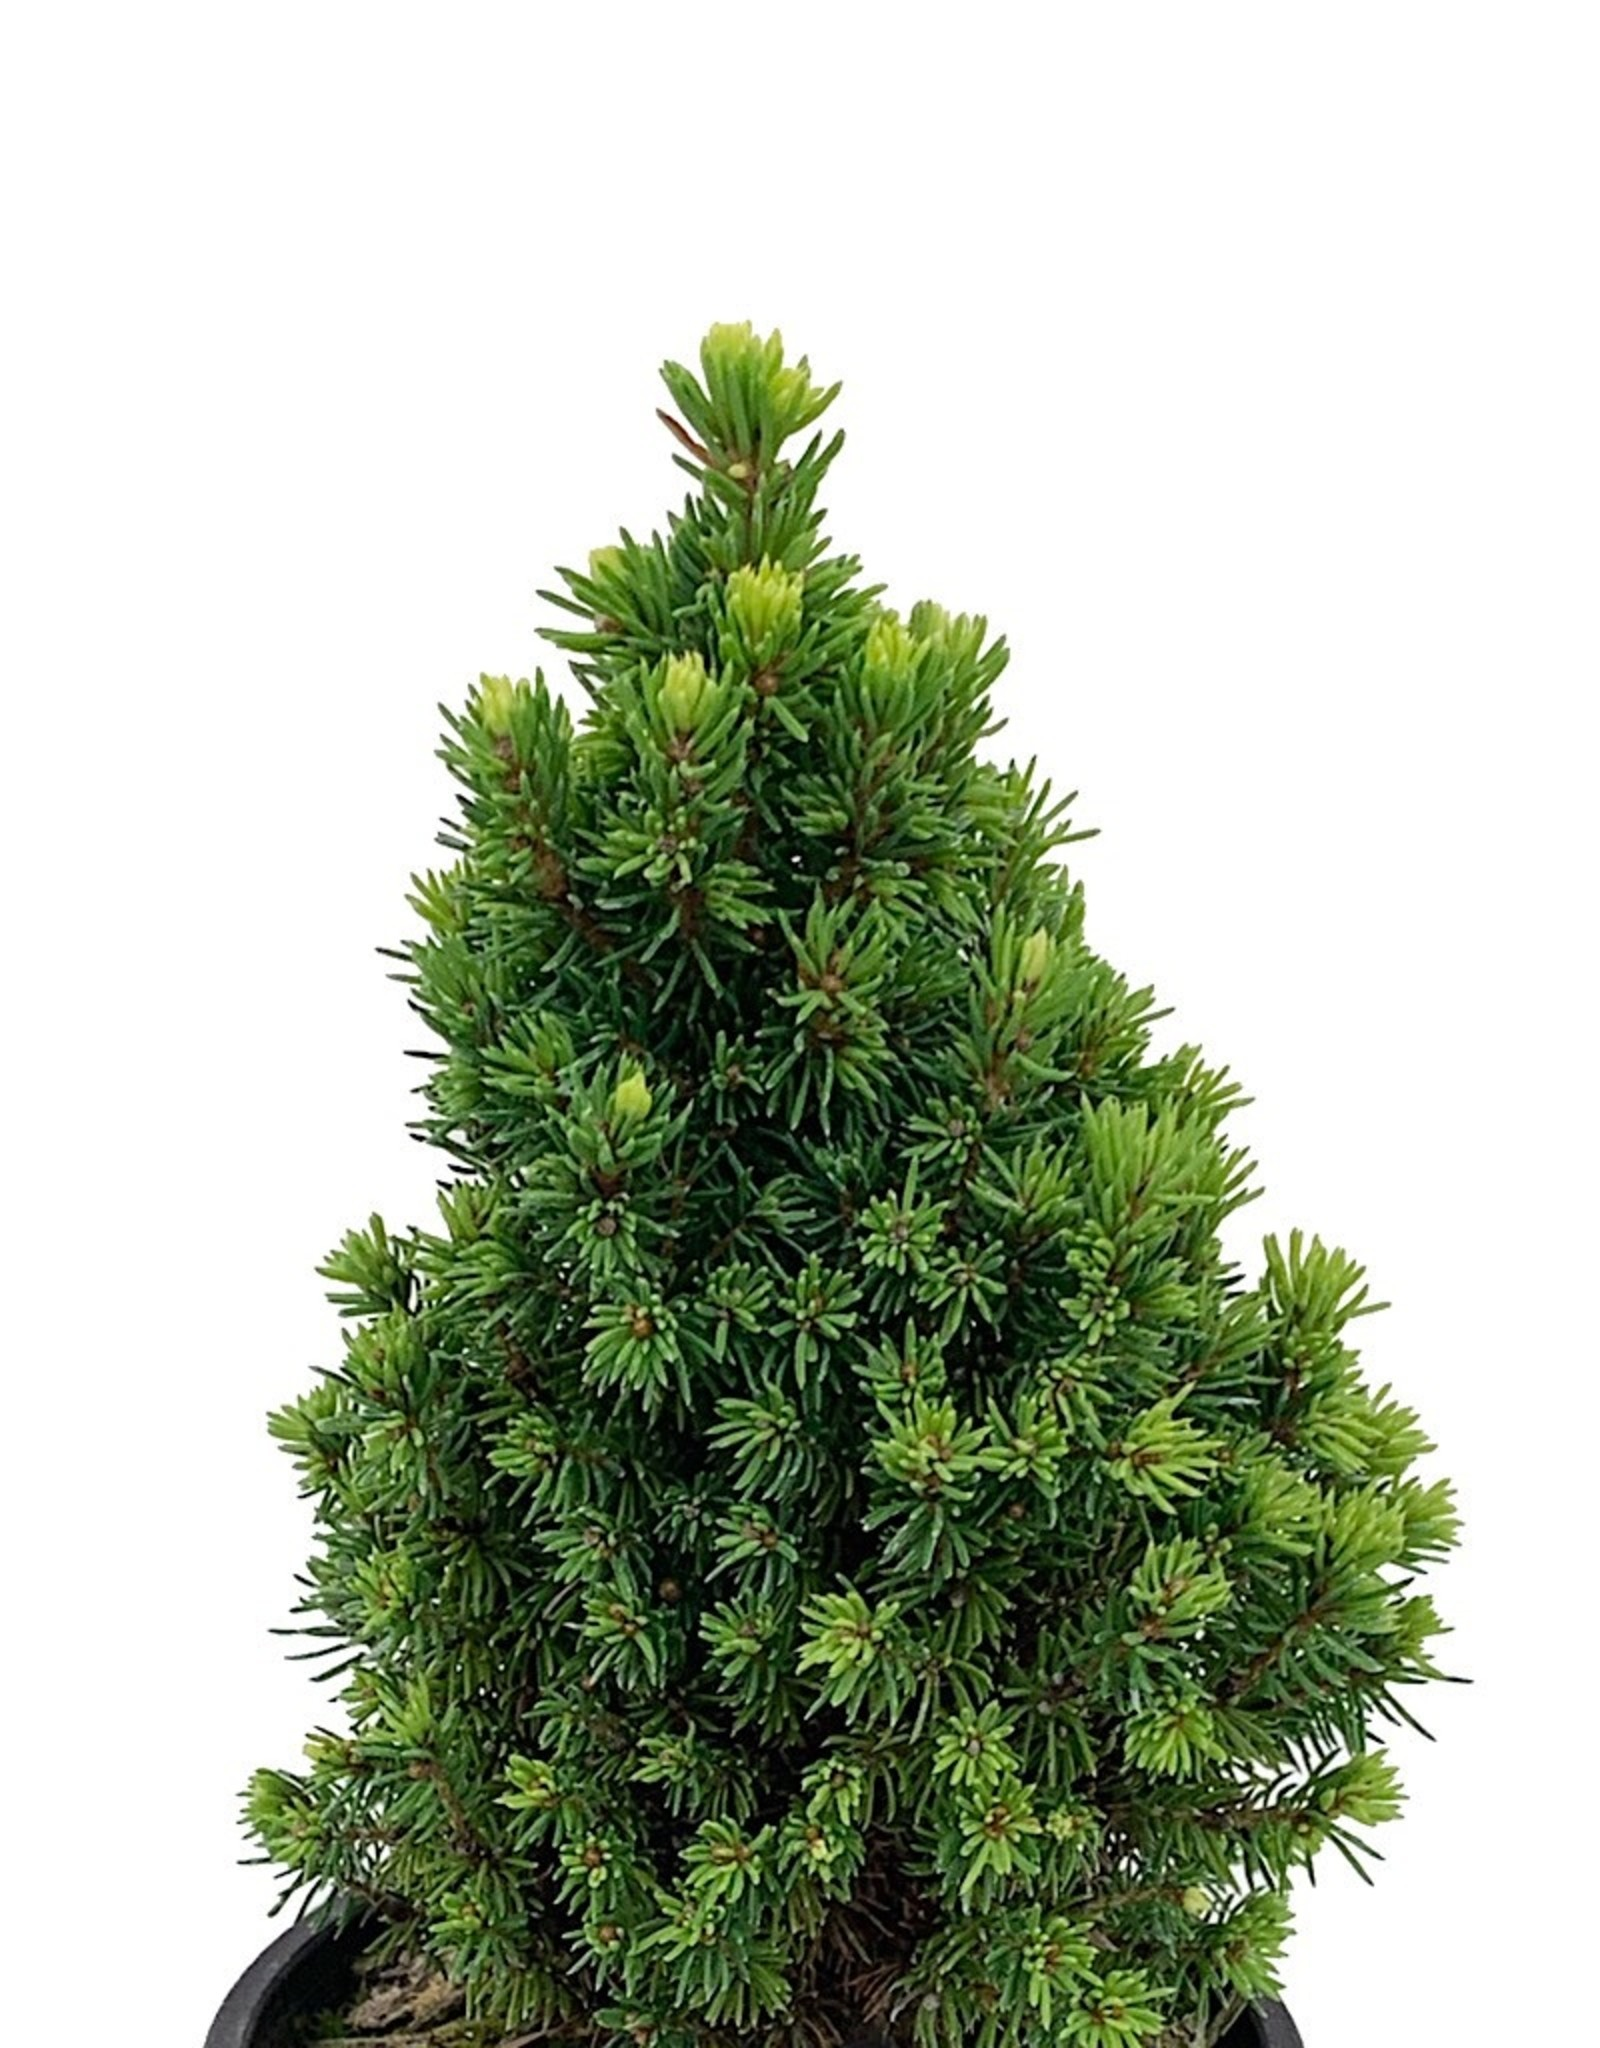 Picea glauca 'Pixie Dust' 4 Inch